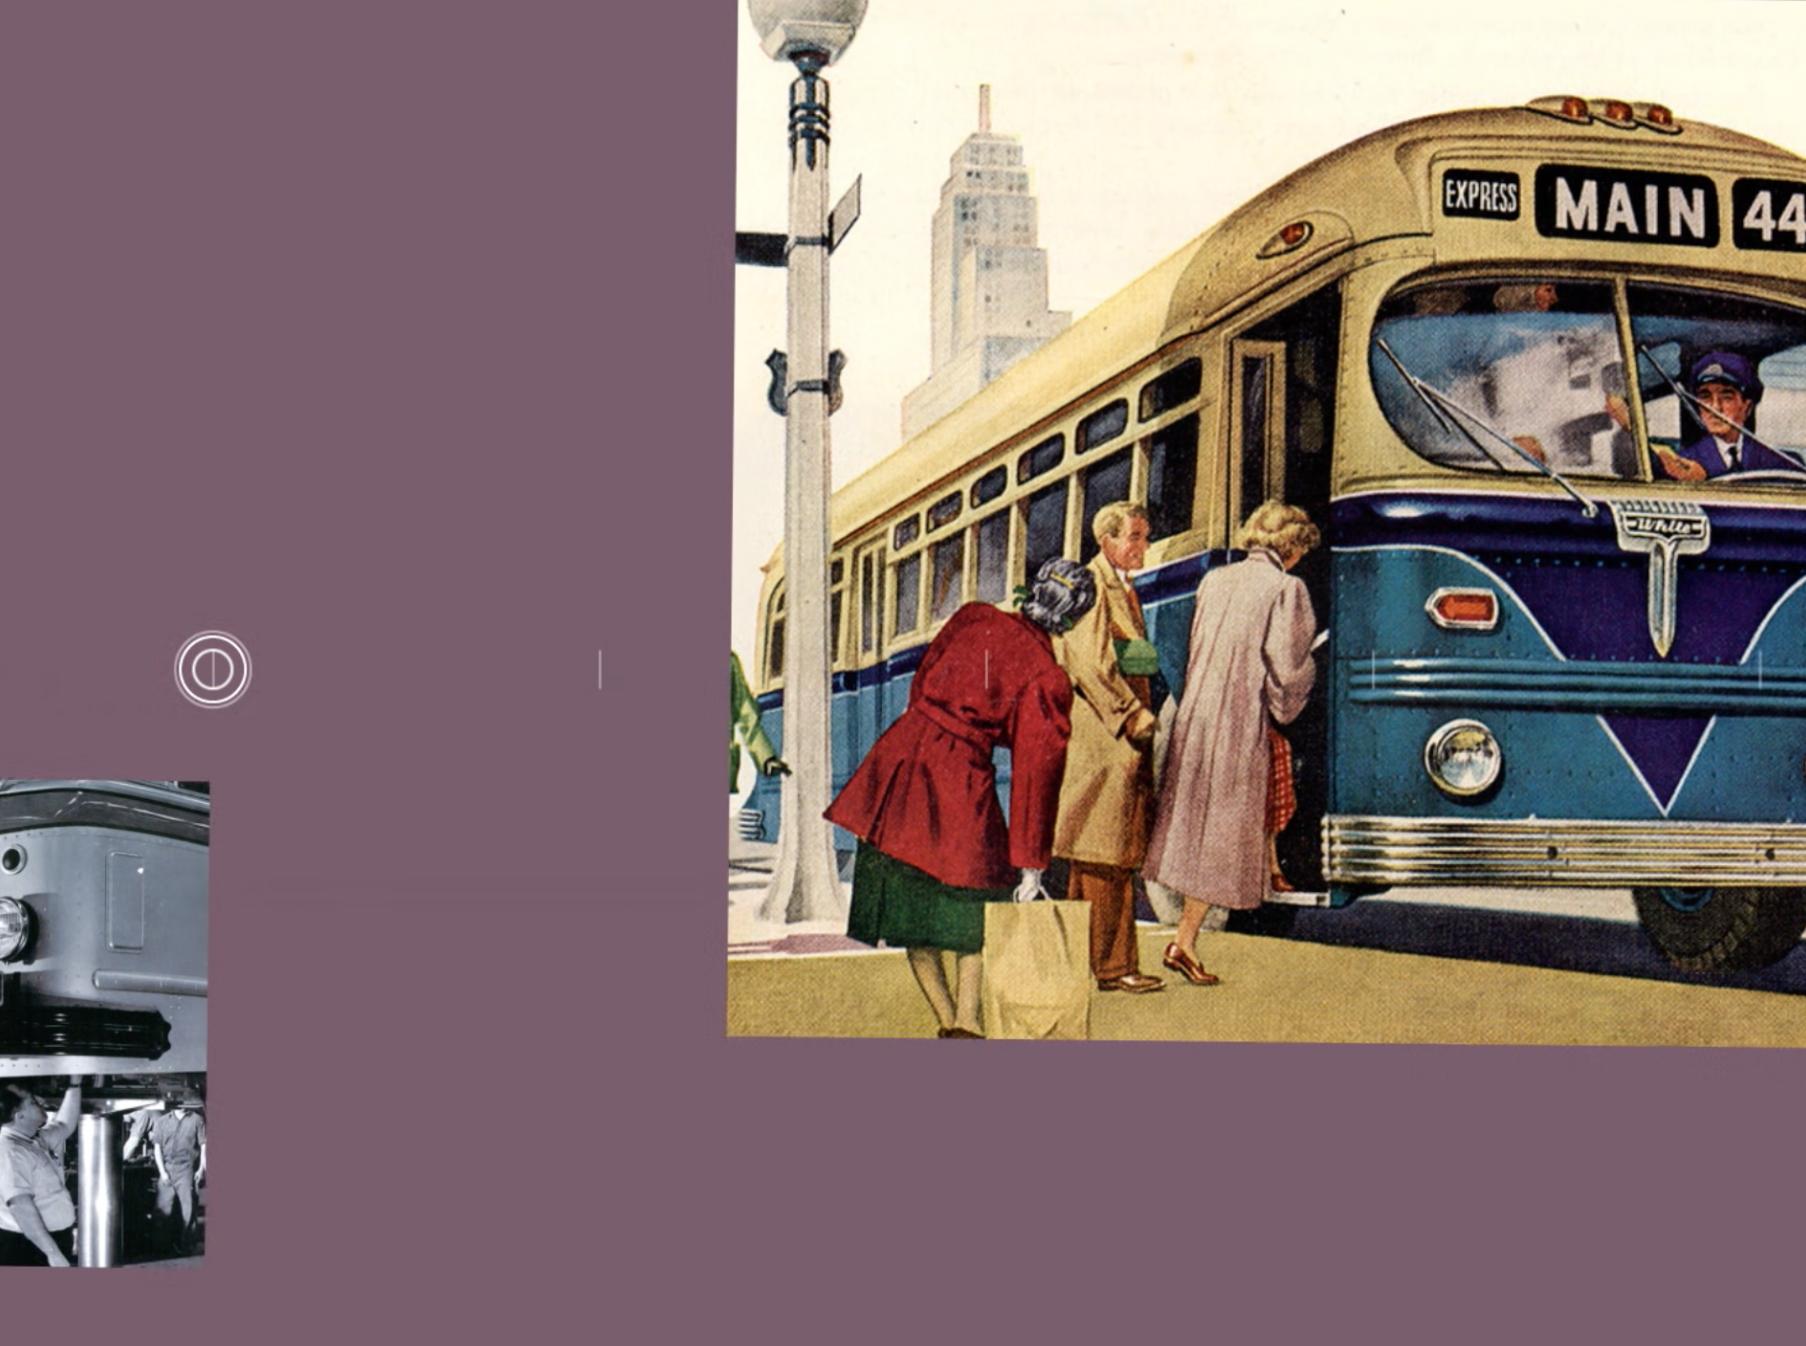 1500 Mission video still showing White Motors bus illustration